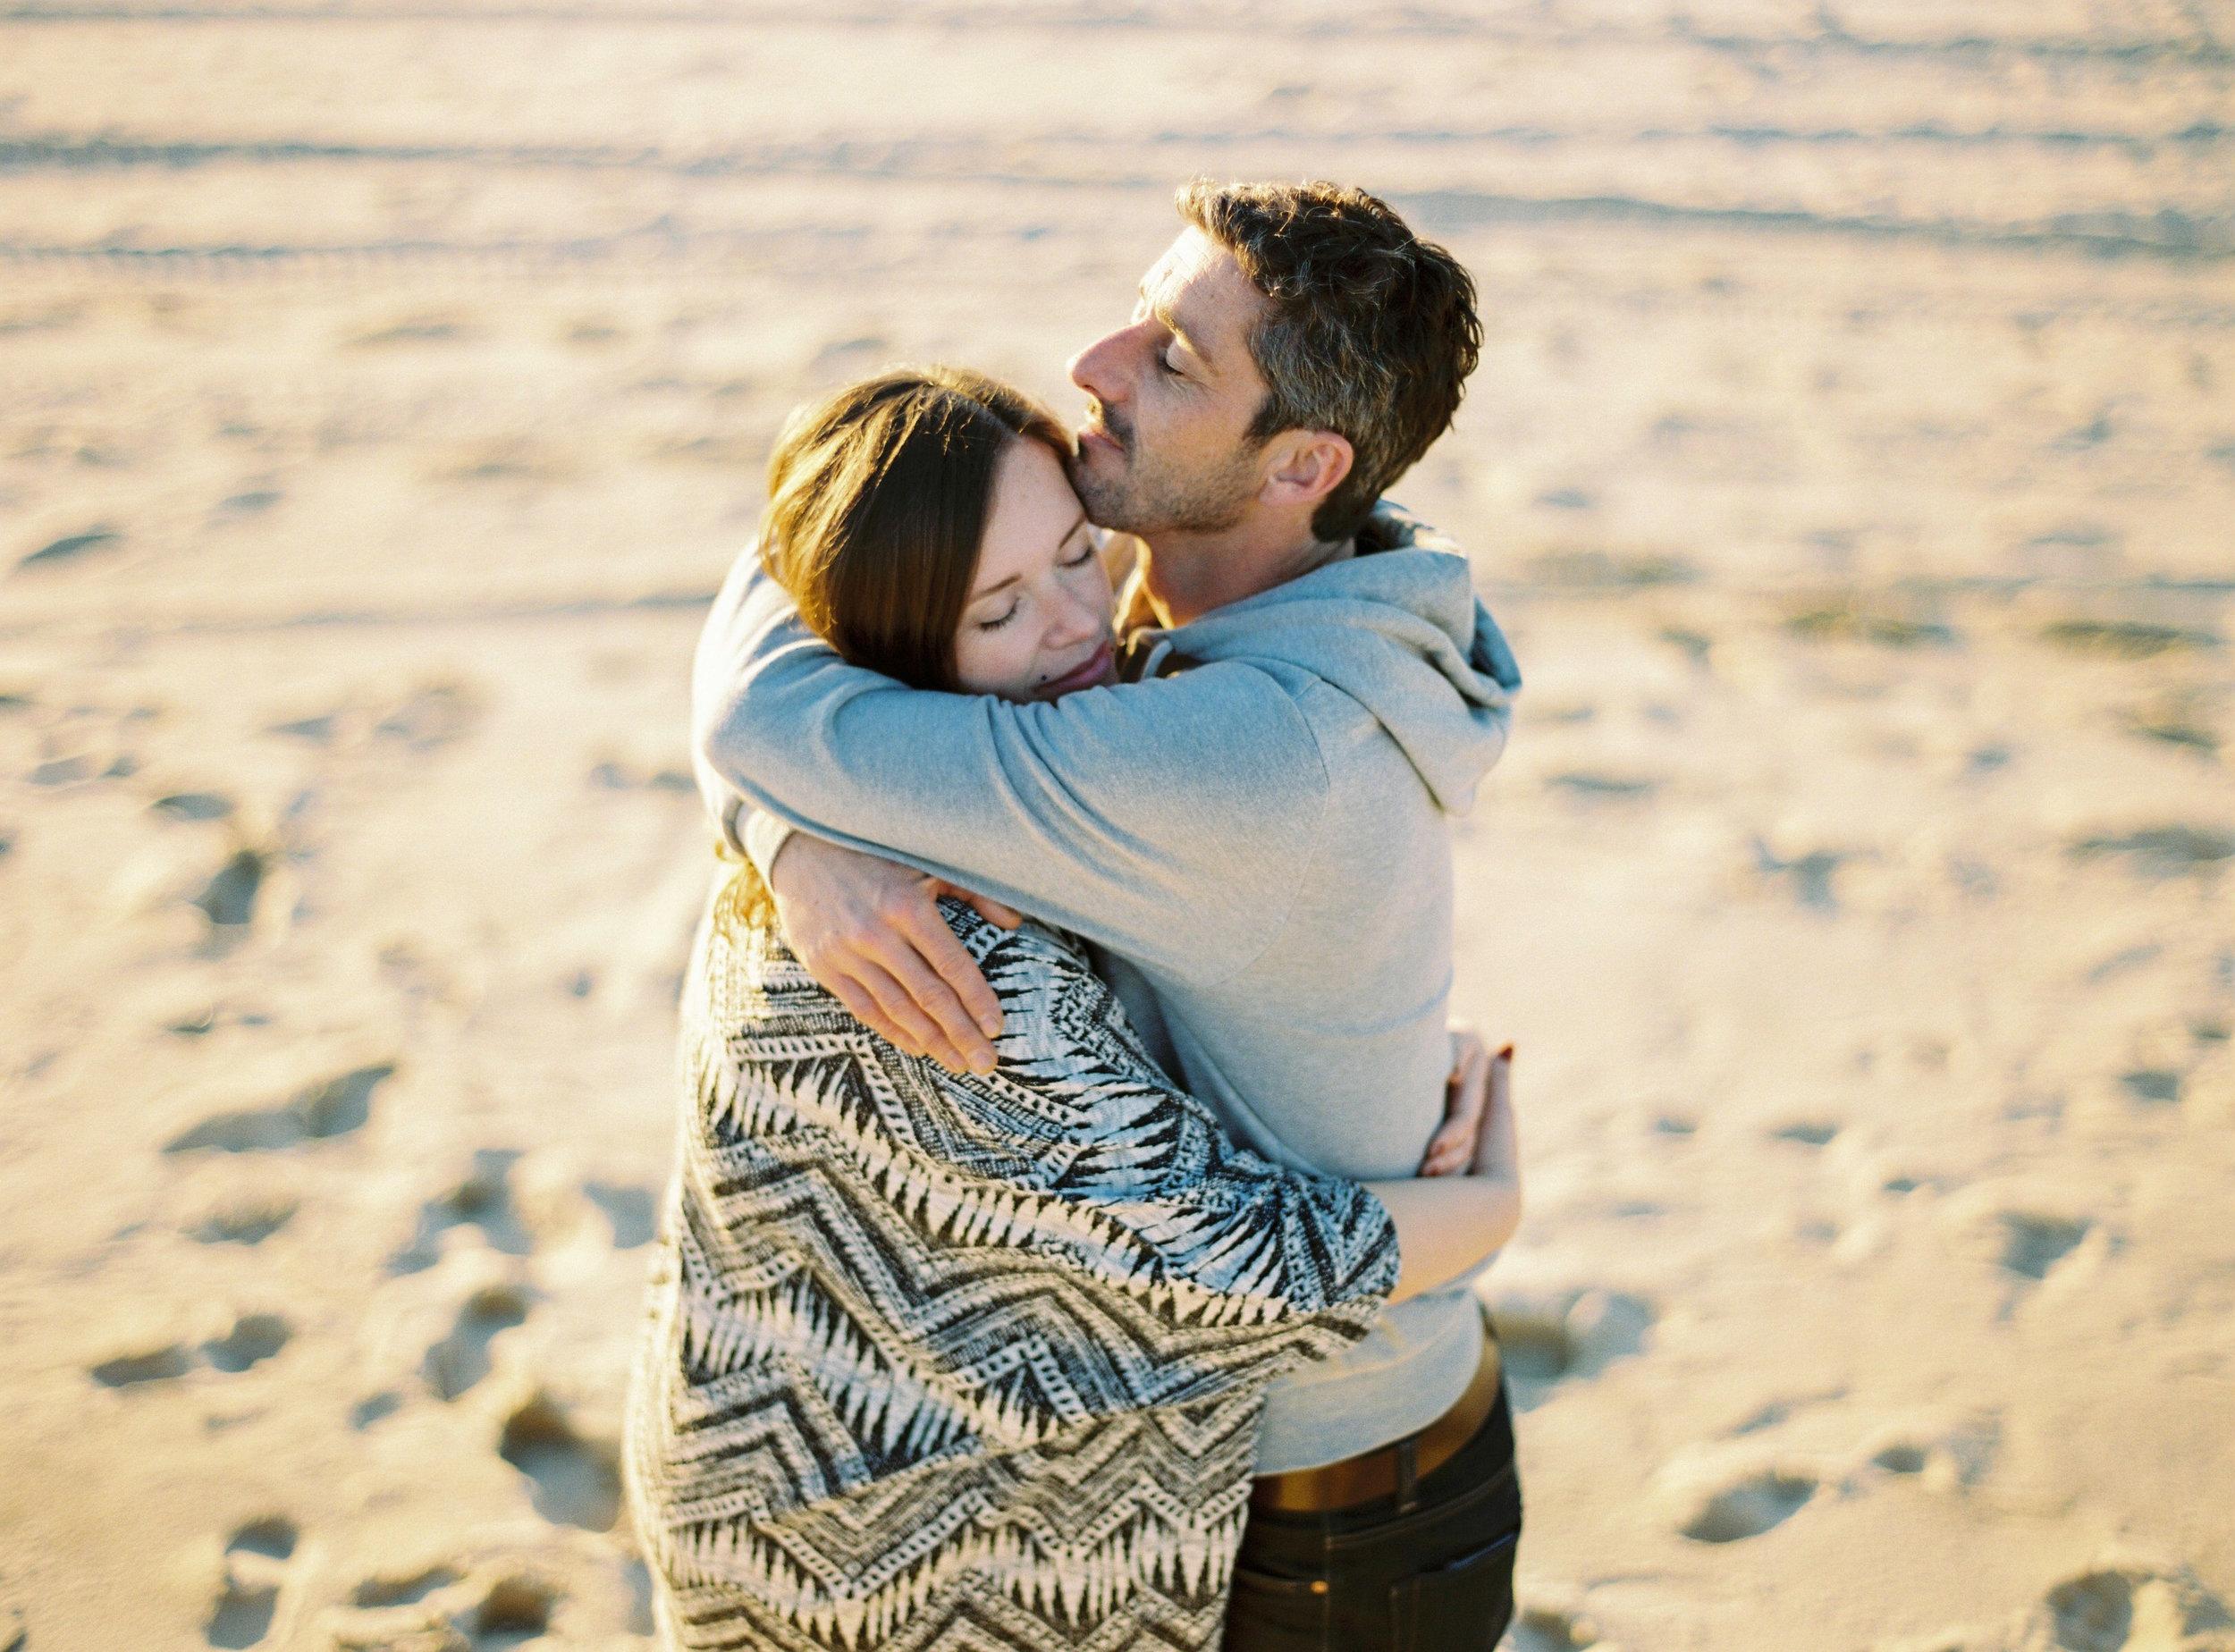 ccelinehamelin-photographe-couple-landes-session-plage-lovers-photography-photographe-seignosse-argentique-onfilm9.jpg